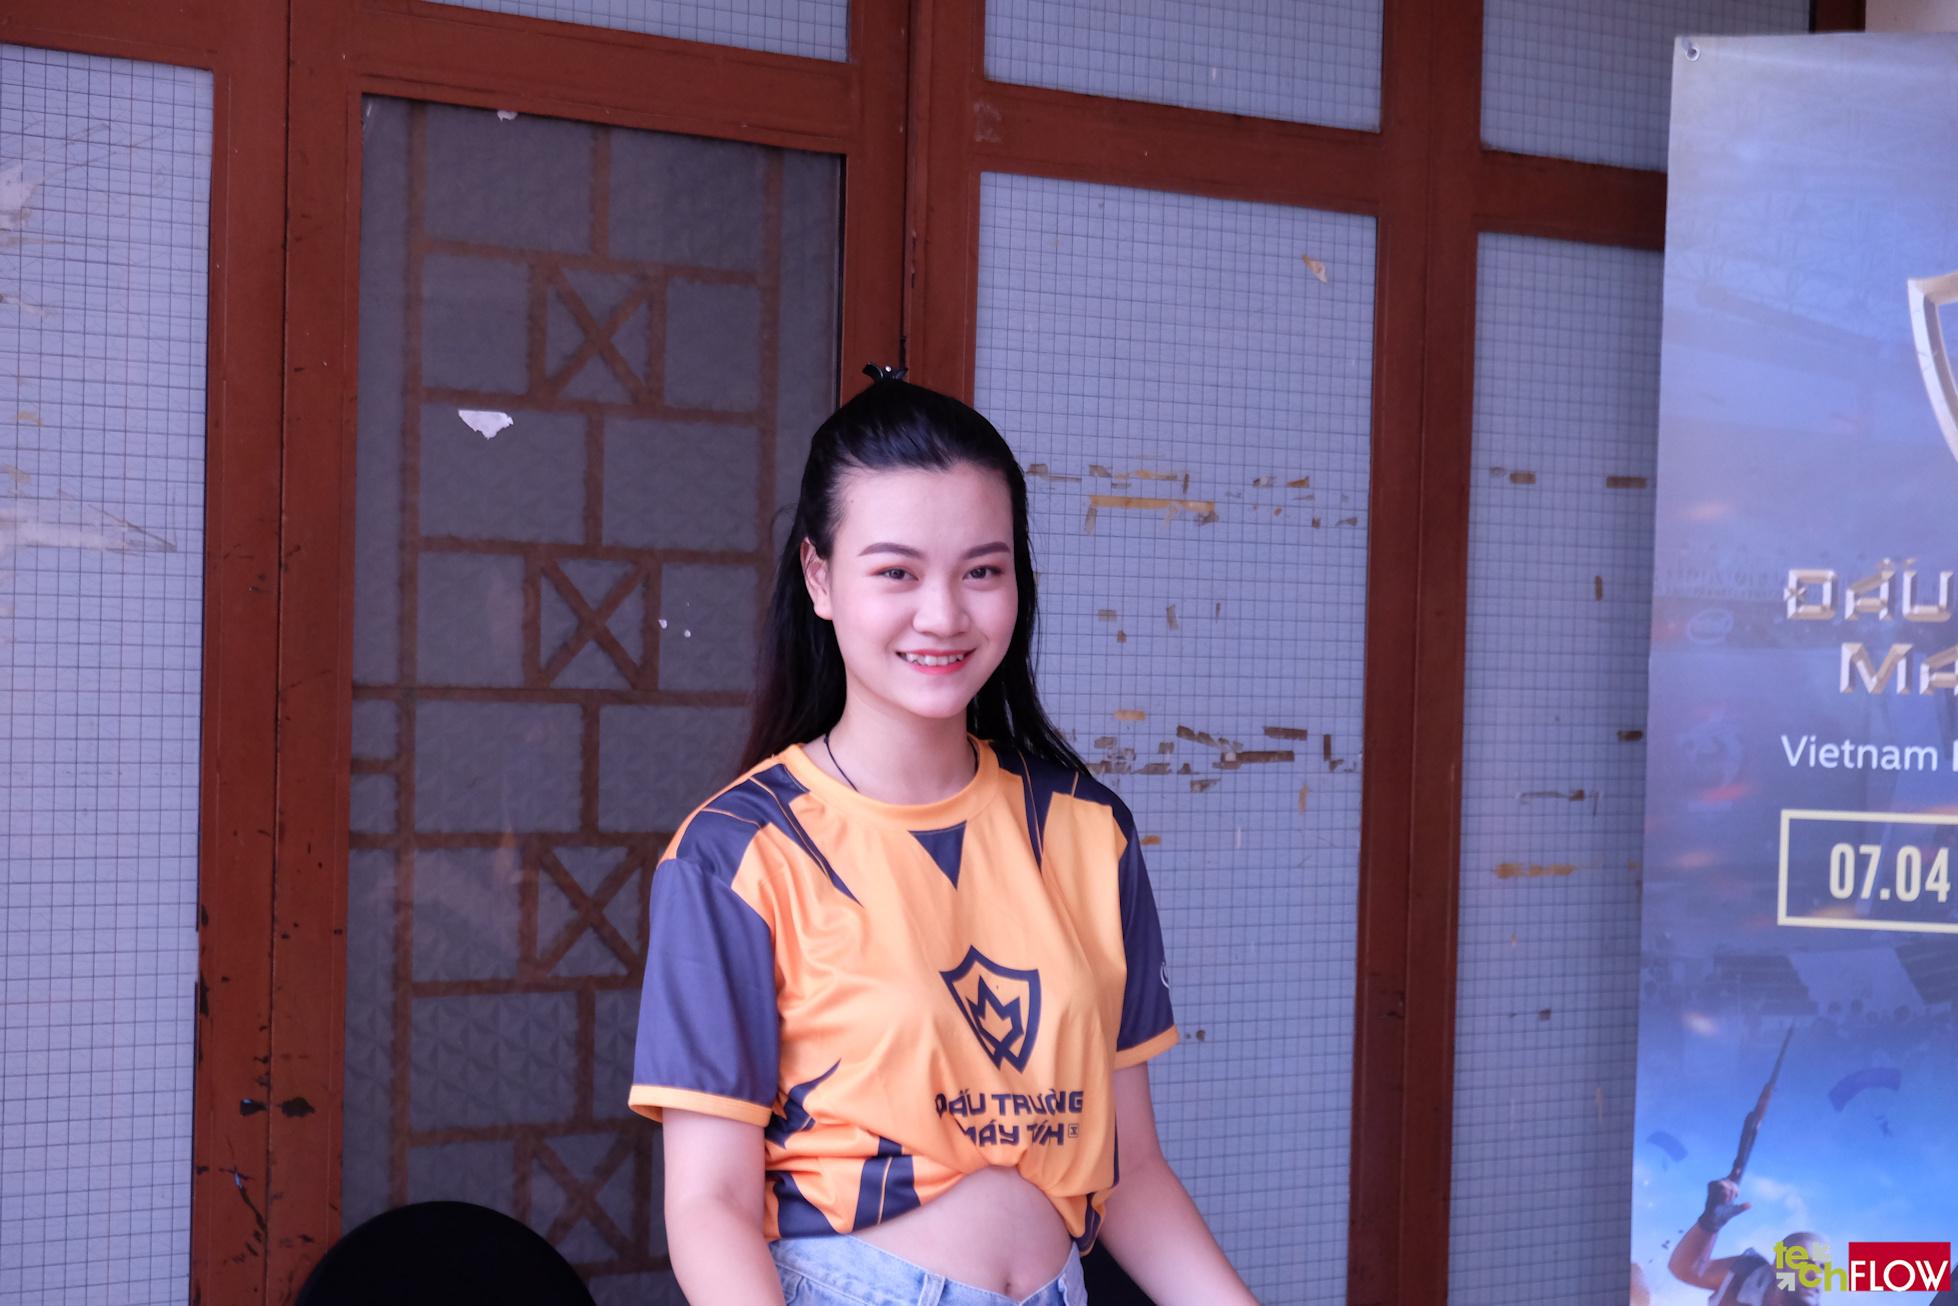 Su-Kien-Dau-Truong-May-Tinh-Mua5-122